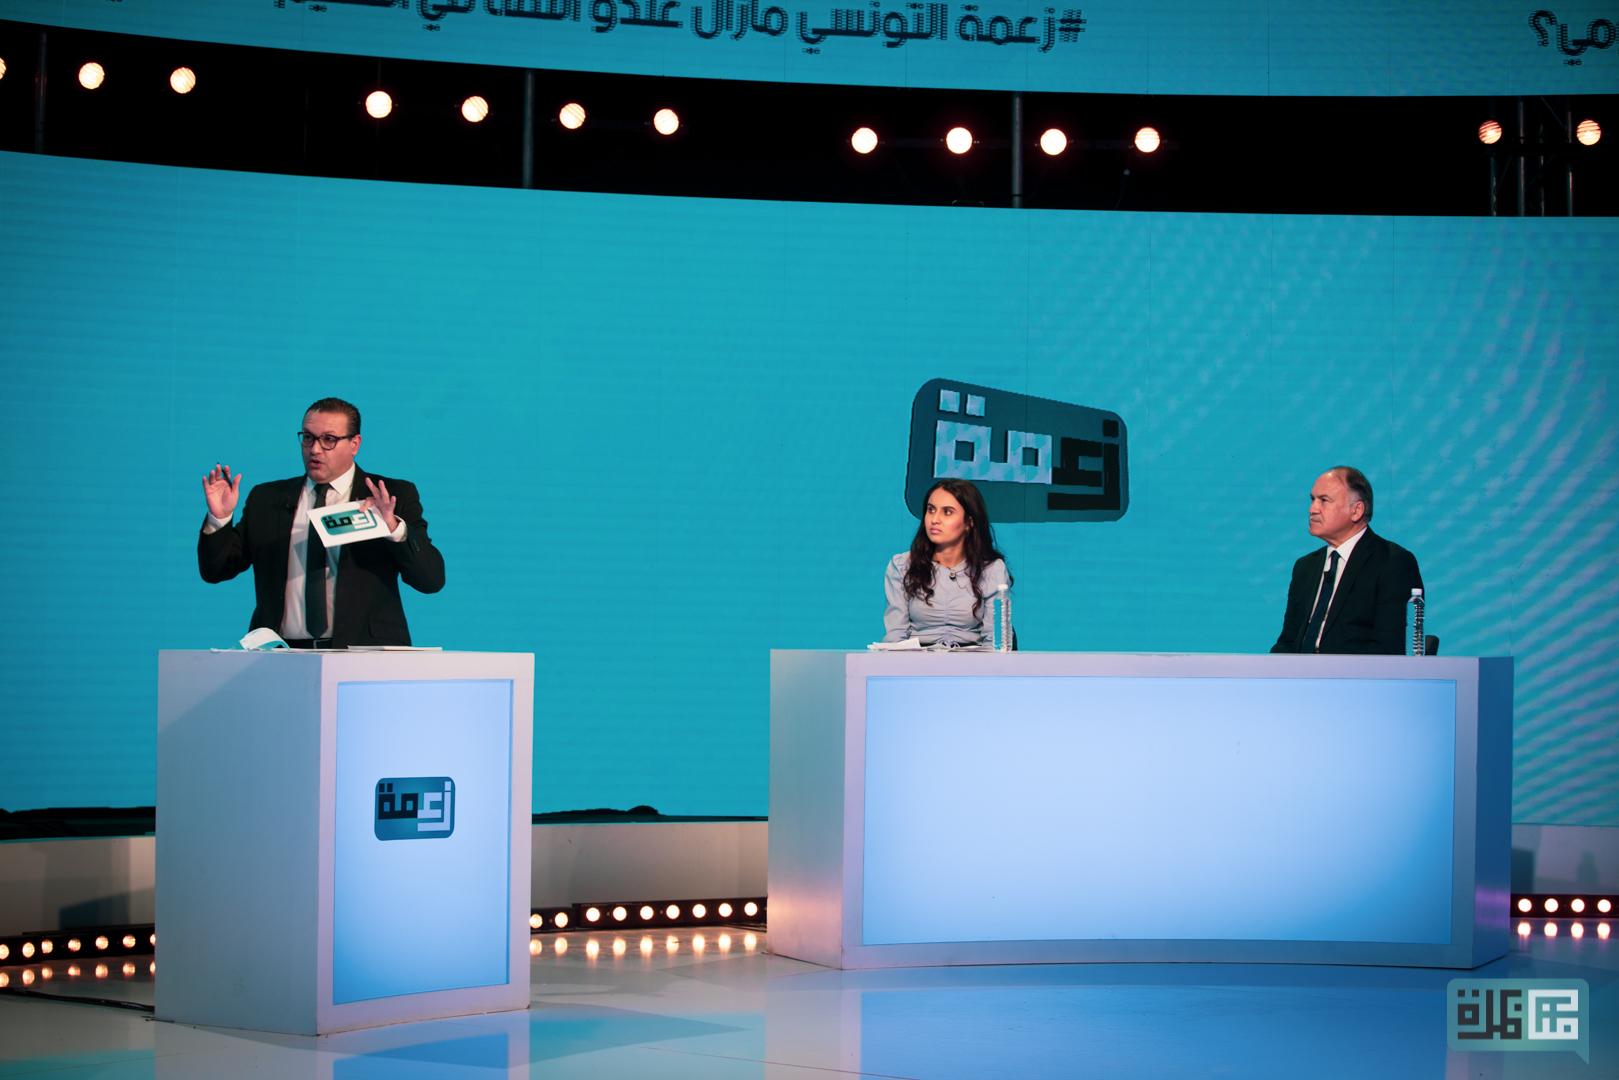 Debate Tunisia Youth Studio Education Public Democracy